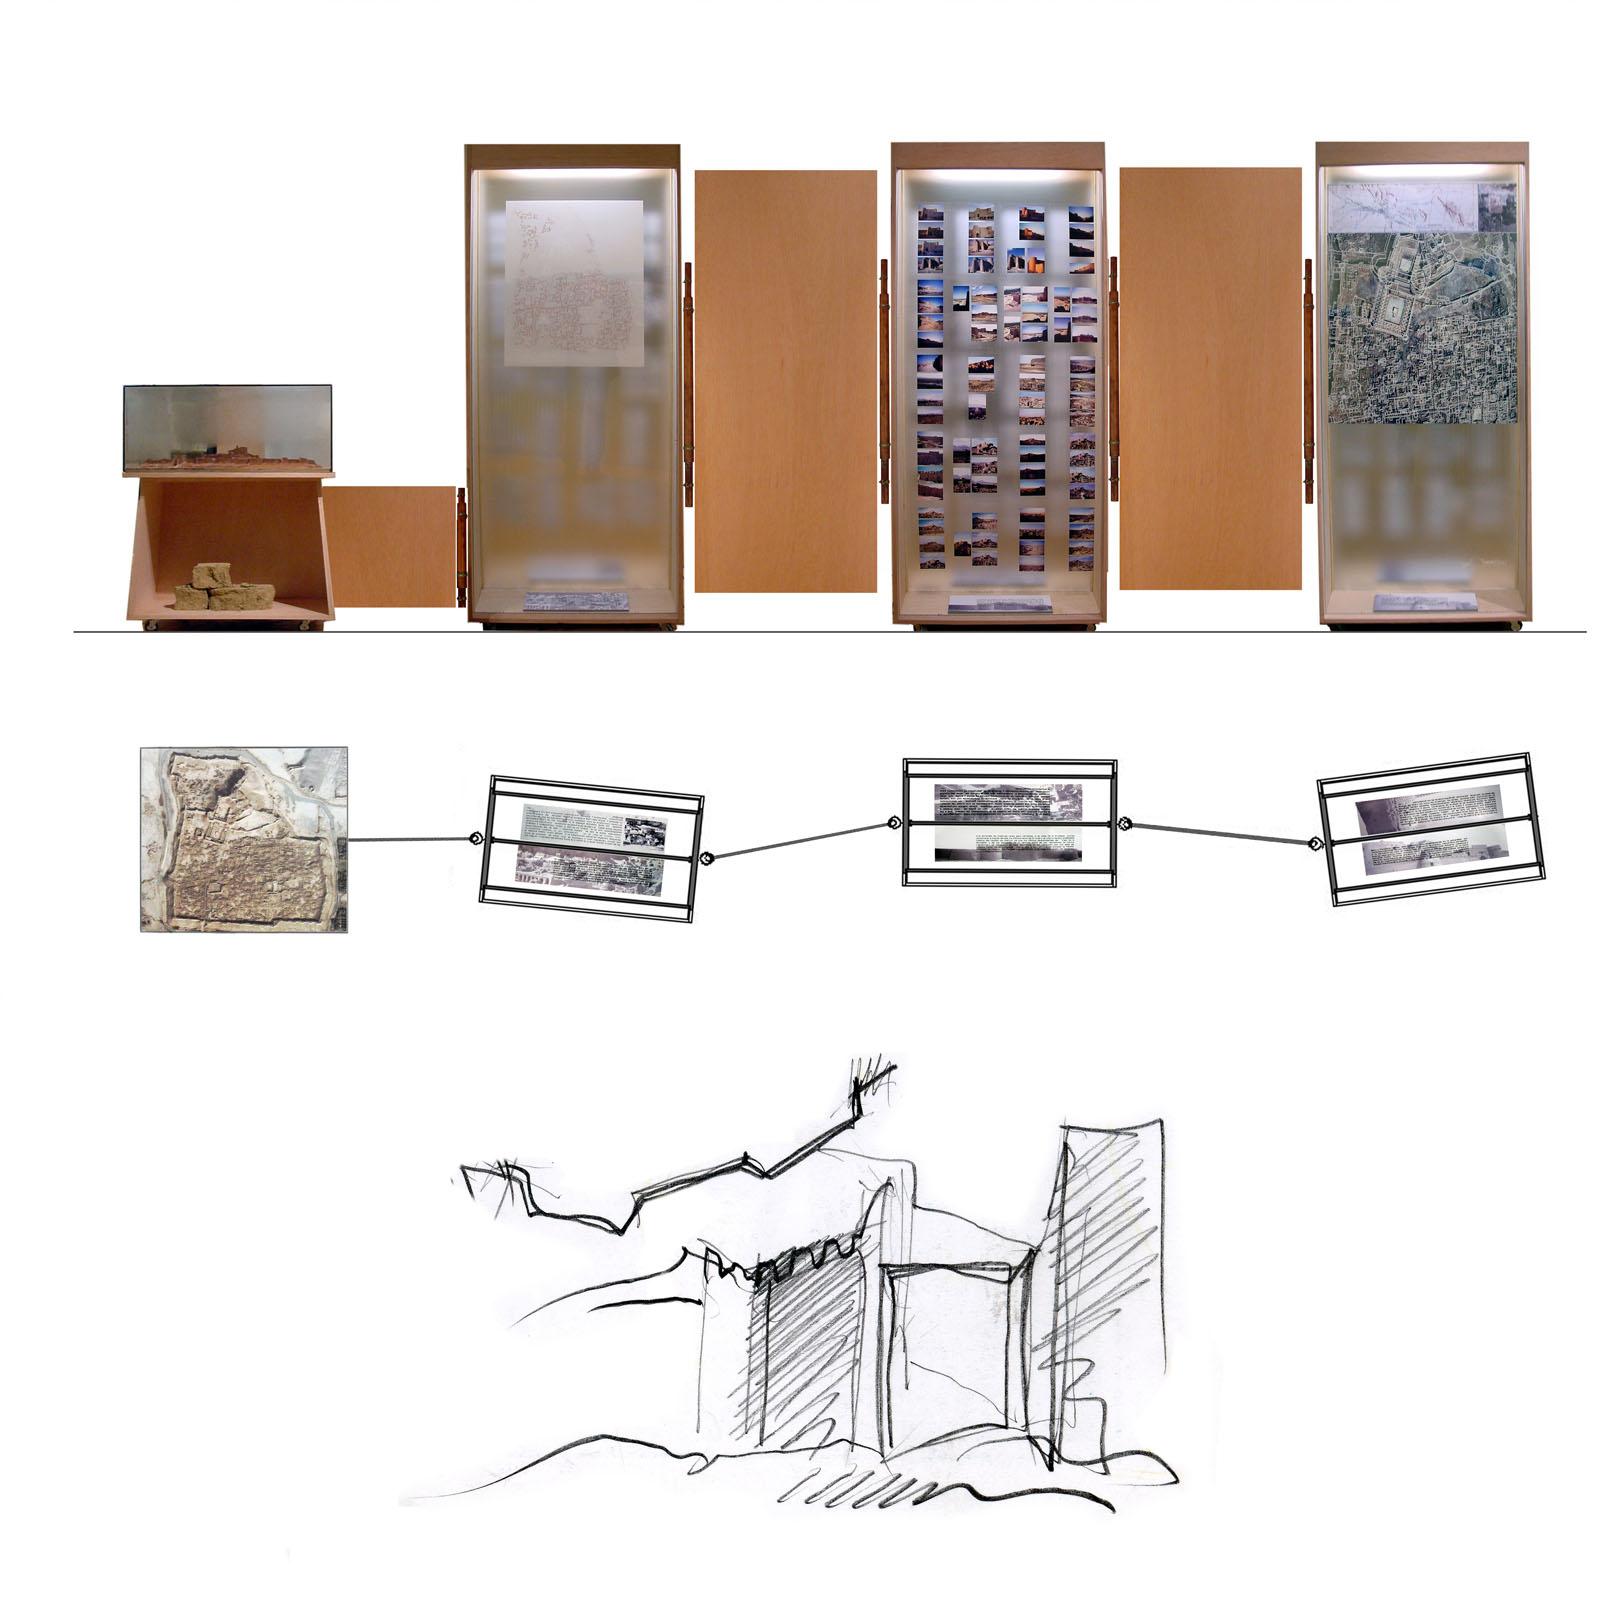 danielvillalobos-architecturalexhibition-bam-architectureofmud-7.2